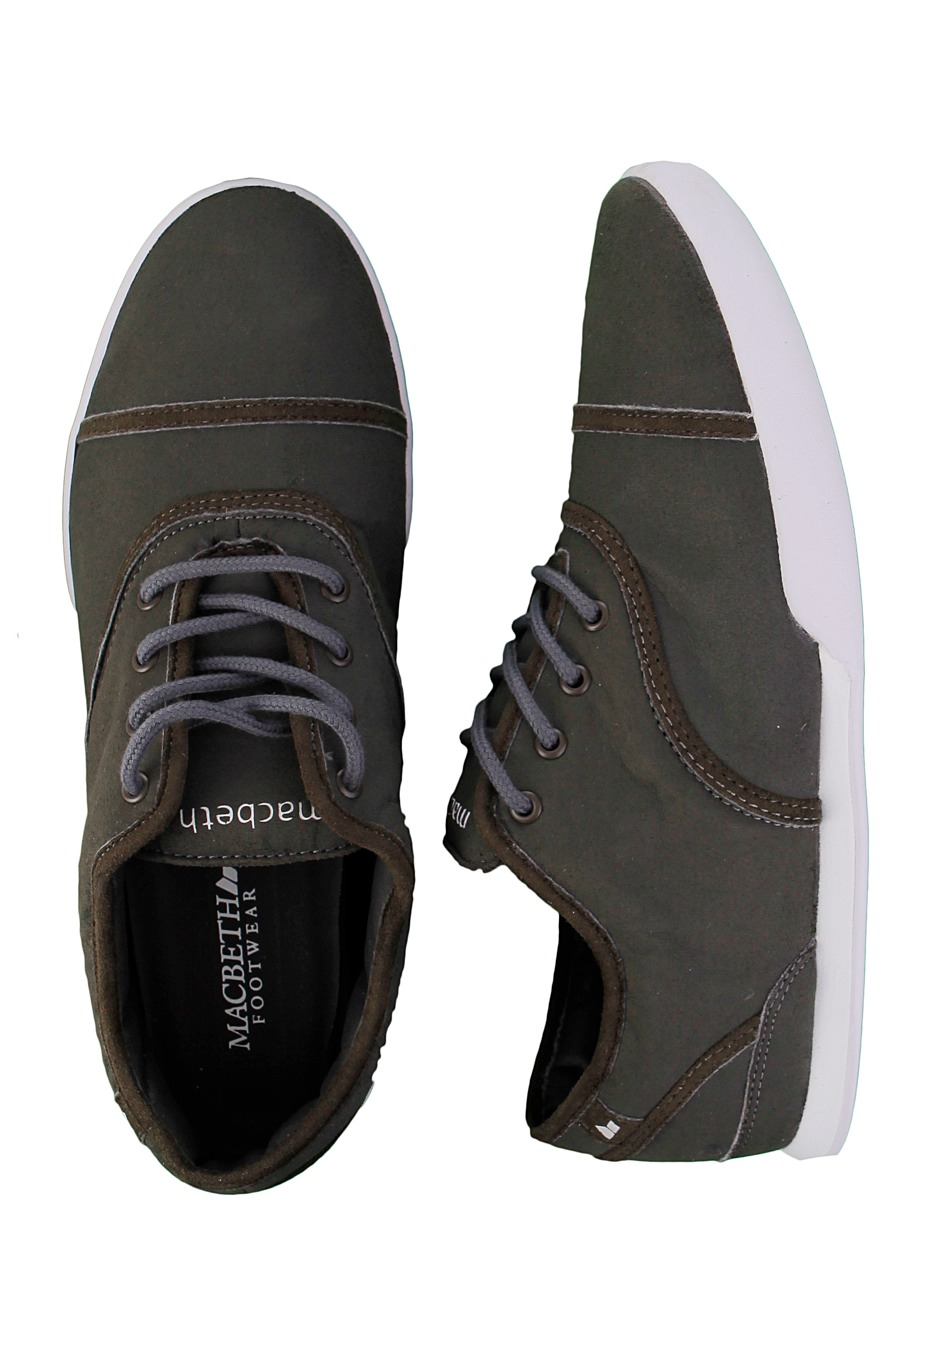 . Macbeth   Gatsby Dark Grey White   Shoes   Impericon com Worldwide